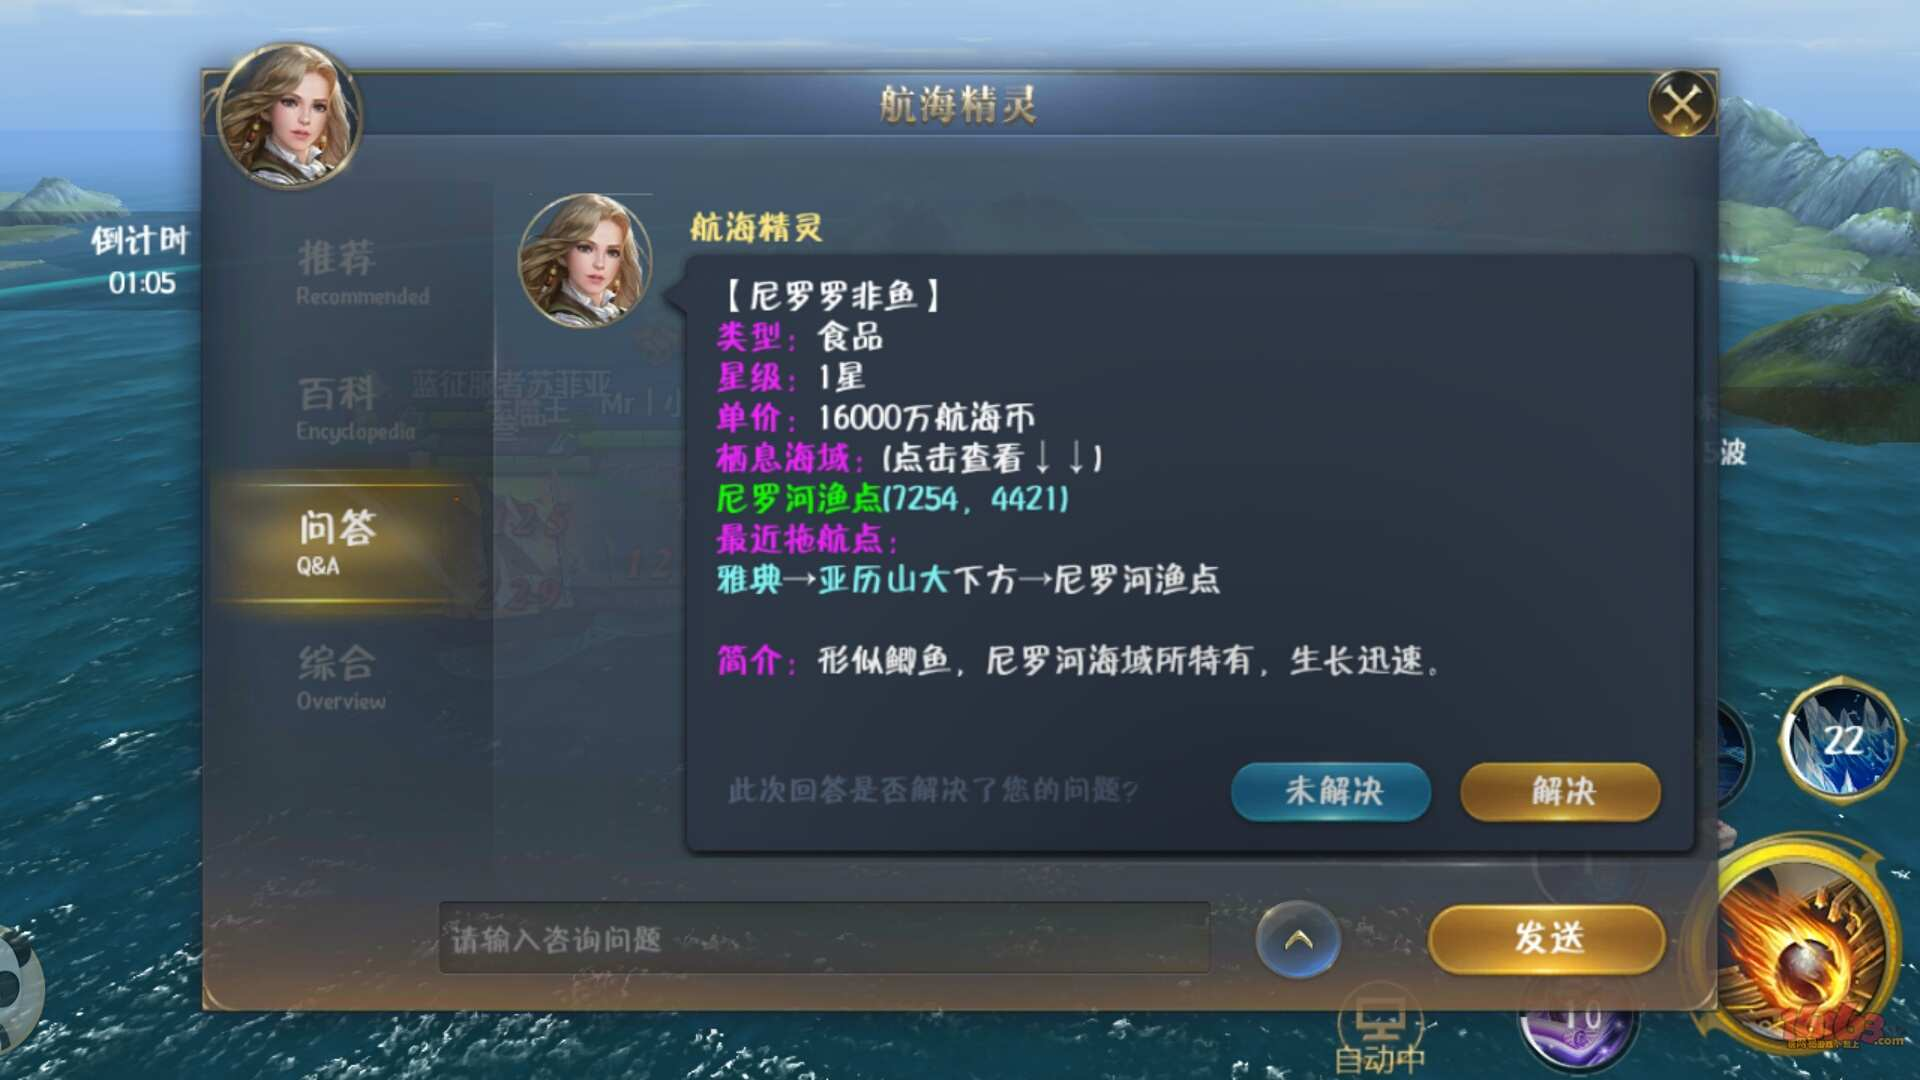 S70901-101149.jpg